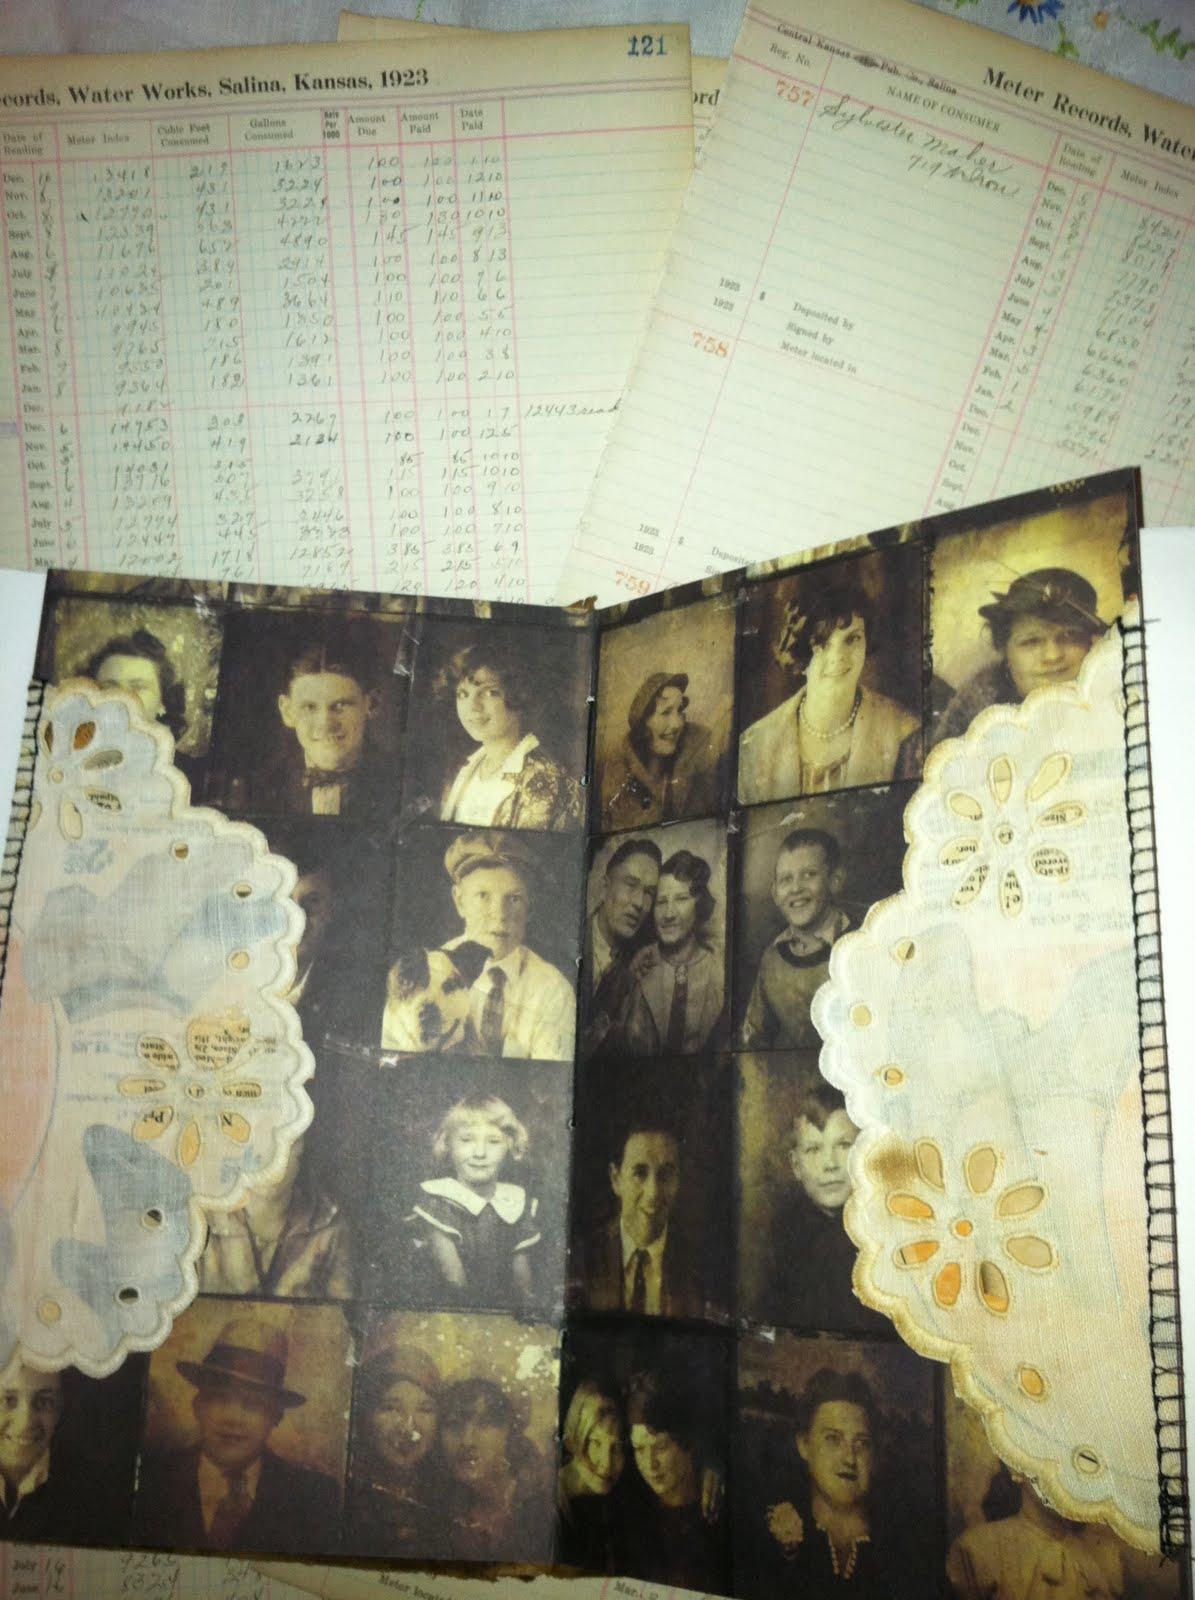 http://1.bp.blogspot.com/-kZ5RSo6uS2g/TkFnvyPtykI/AAAAAAAAA8Q/FjN-iuC7fQw/s1600/Leather+Antique+Pao+Album+Journal+012.JPG